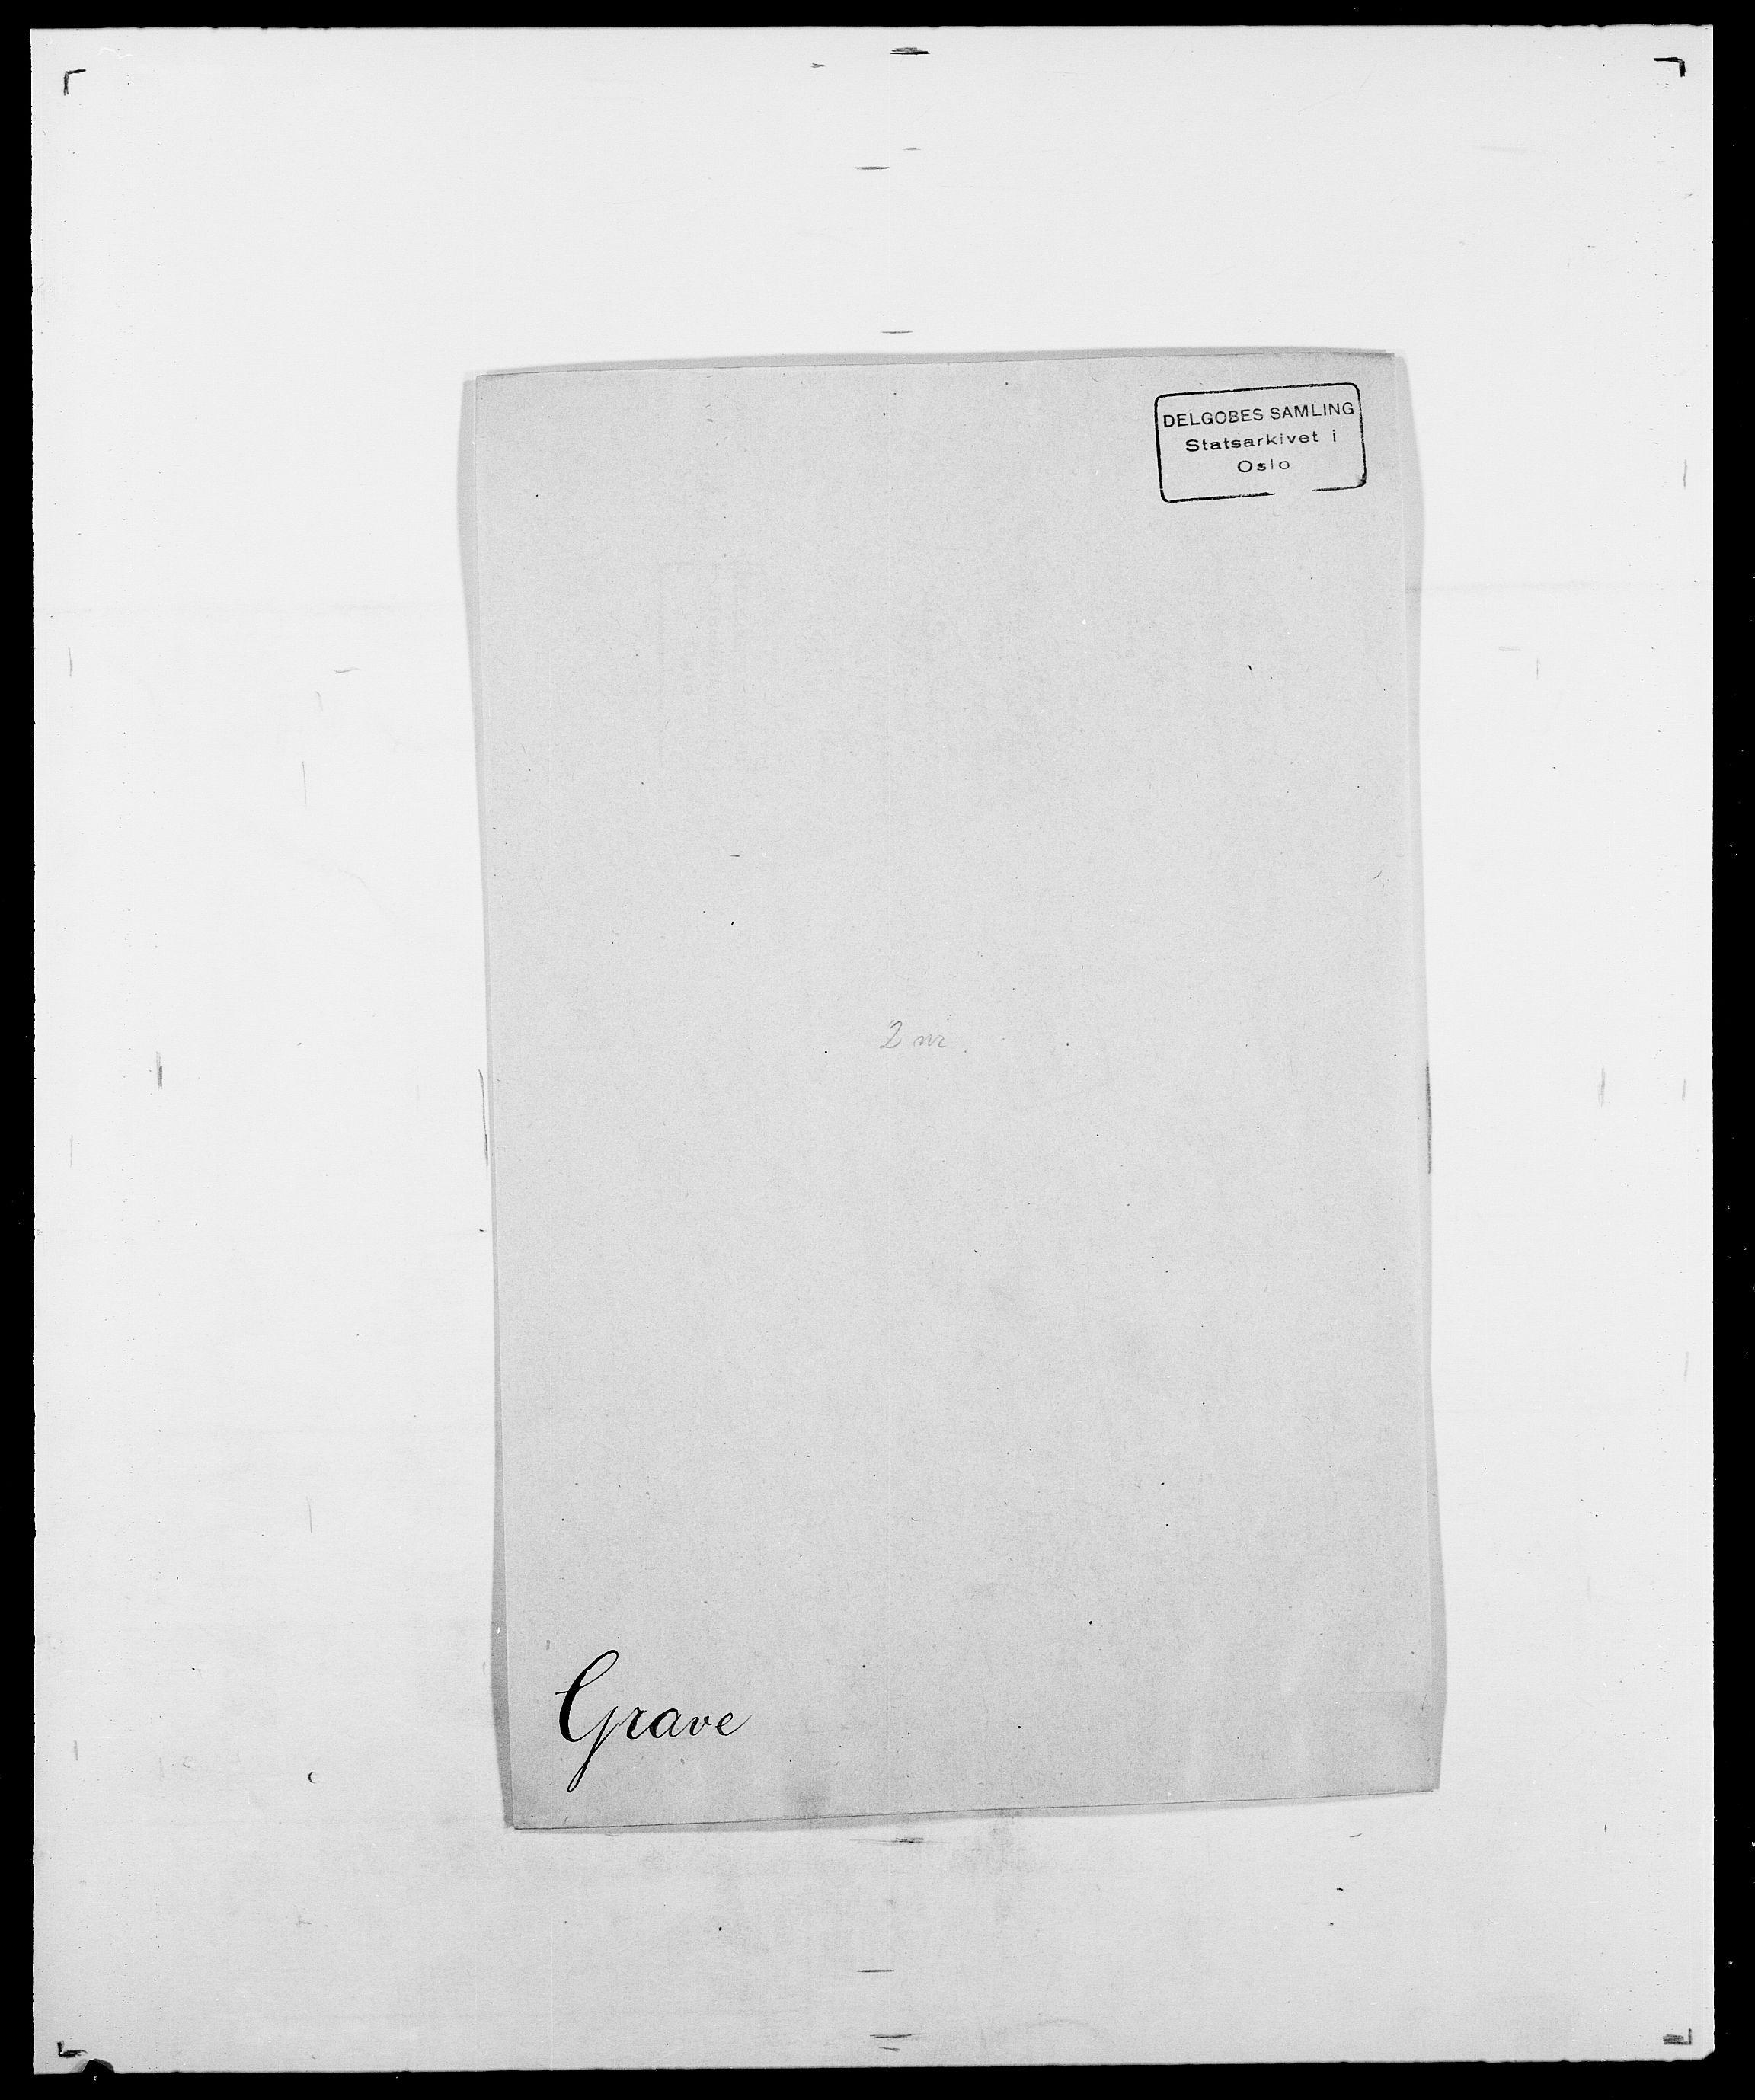 SAO, Delgobe, Charles Antoine - samling, D/Da/L0014: Giebdhausen - Grip, s. 557